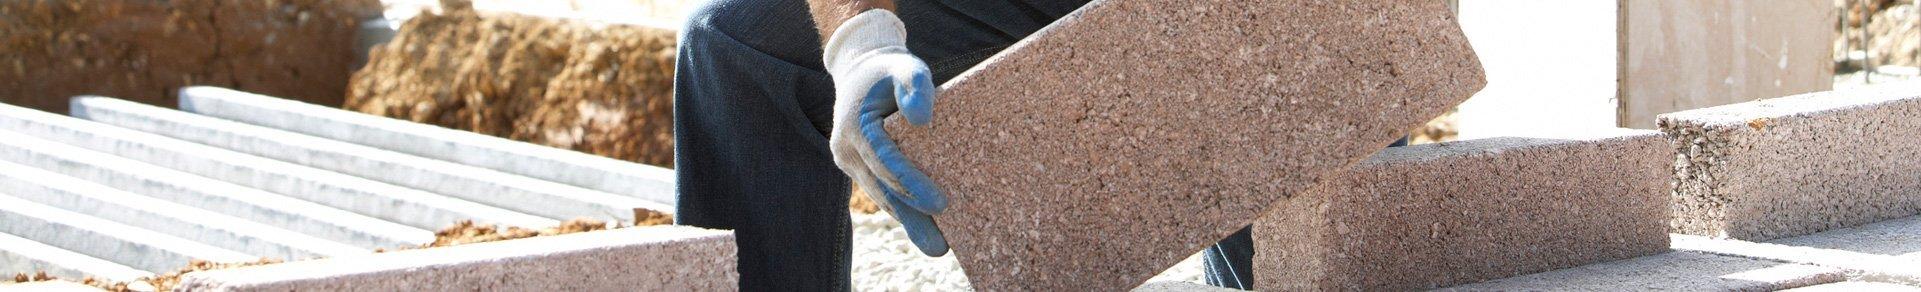 contractor laying masonry blocks